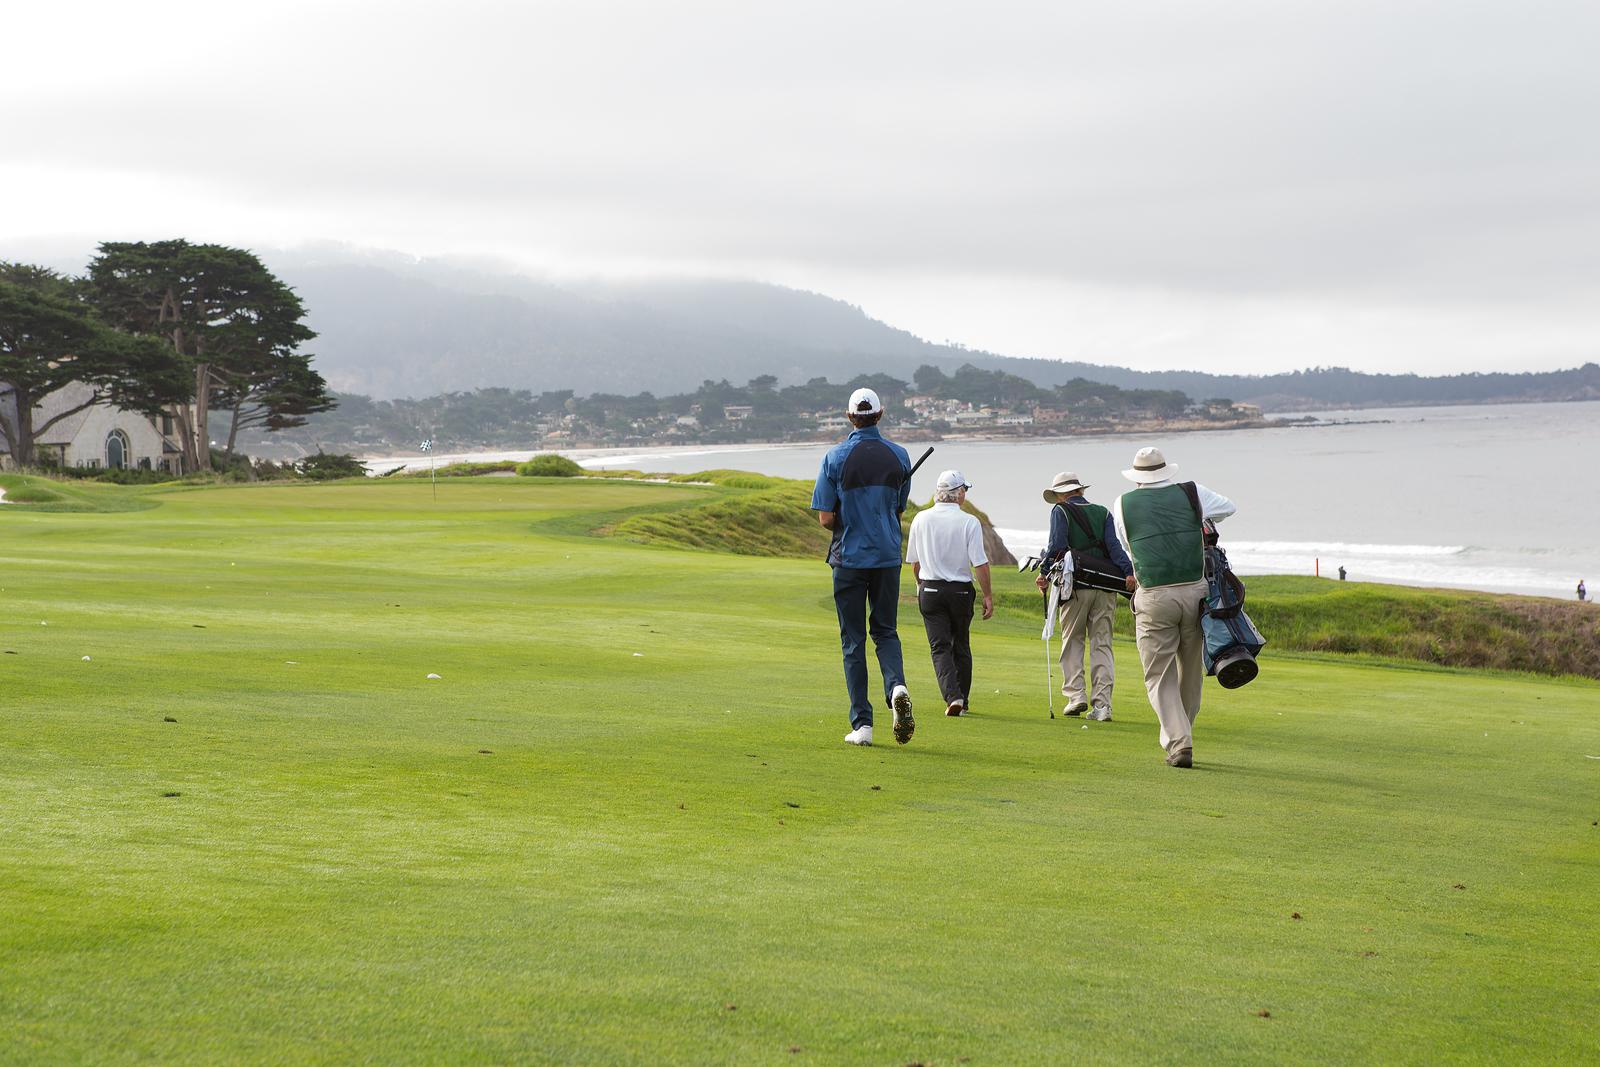 Famous Pebble Beach Golf Links